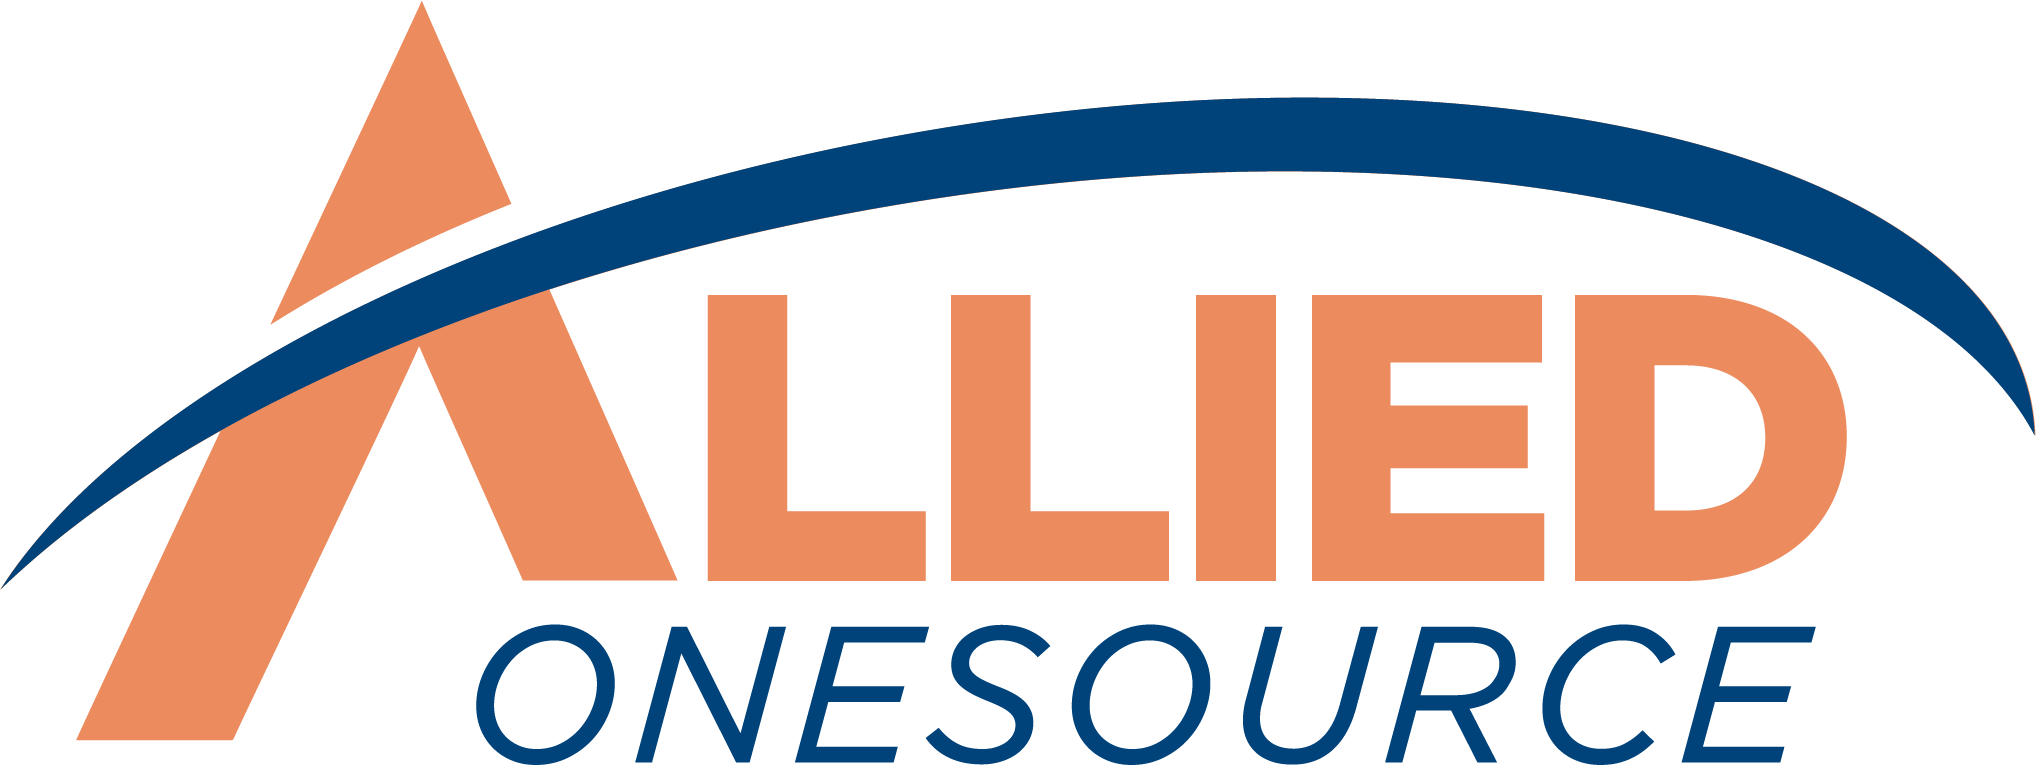 Allied OneSource Logo